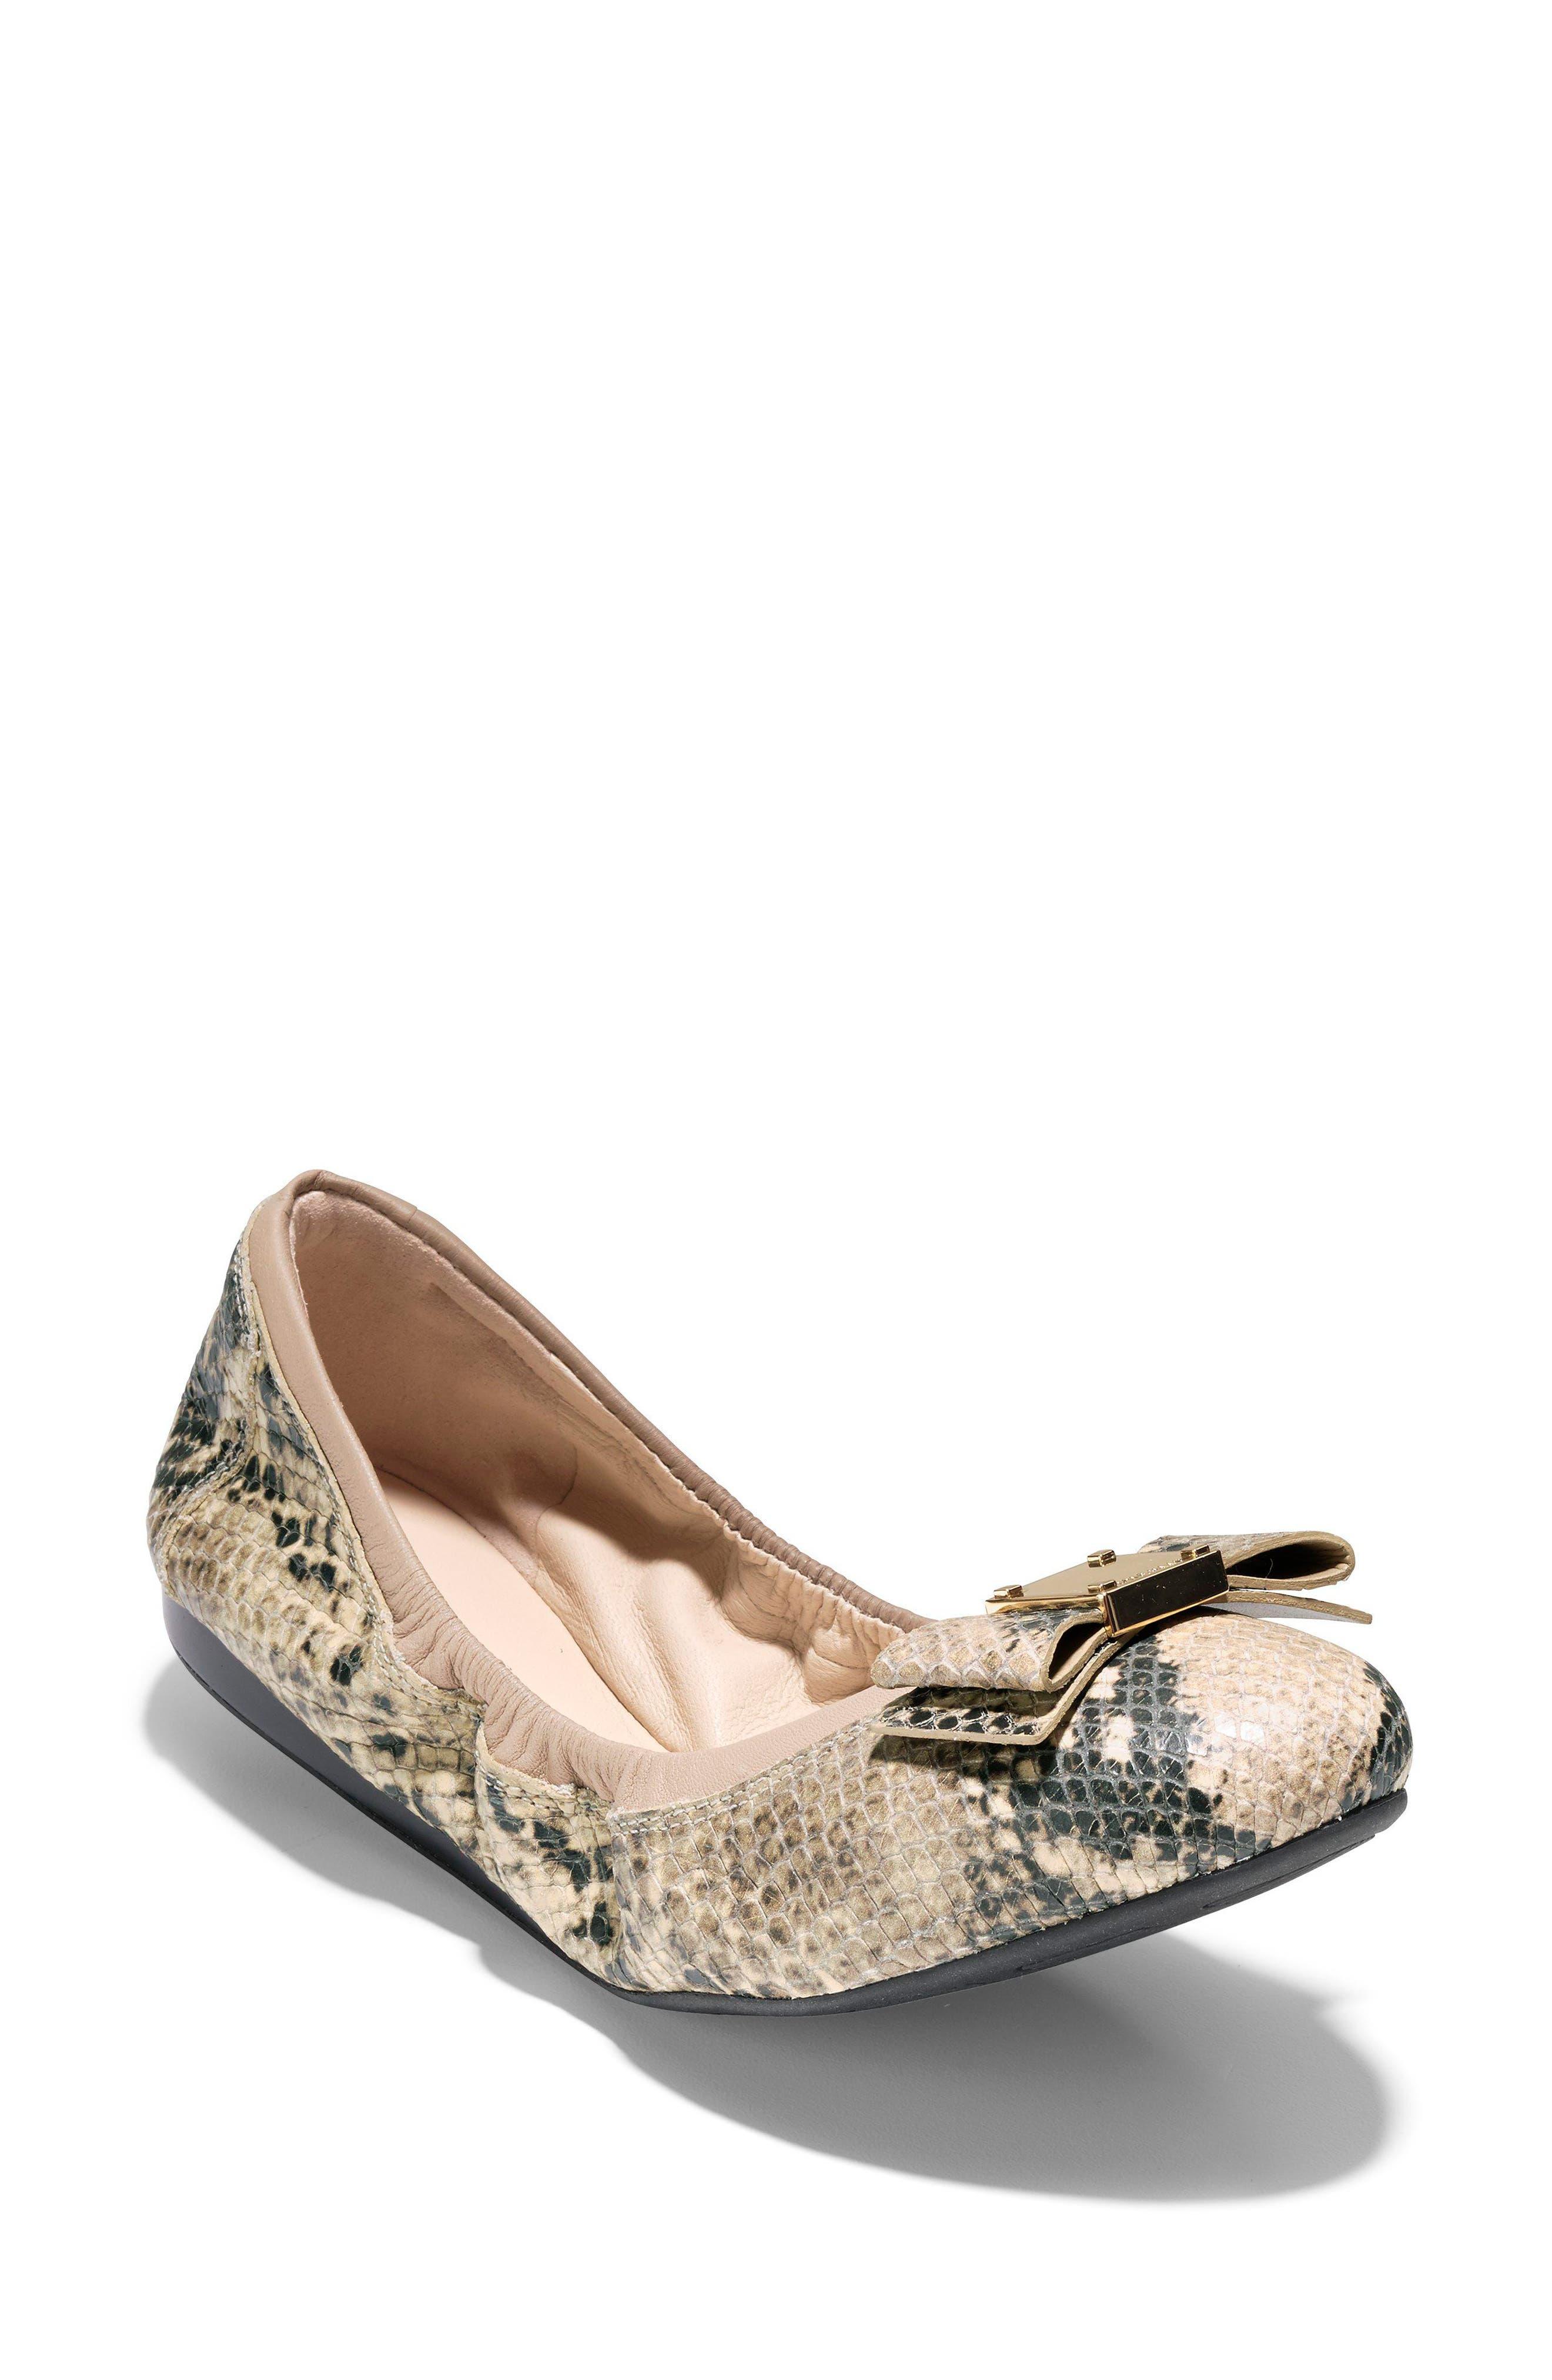 'Tali' Bow Ballet Flat,                             Main thumbnail 1, color,                             Roccia Snake Print Leather